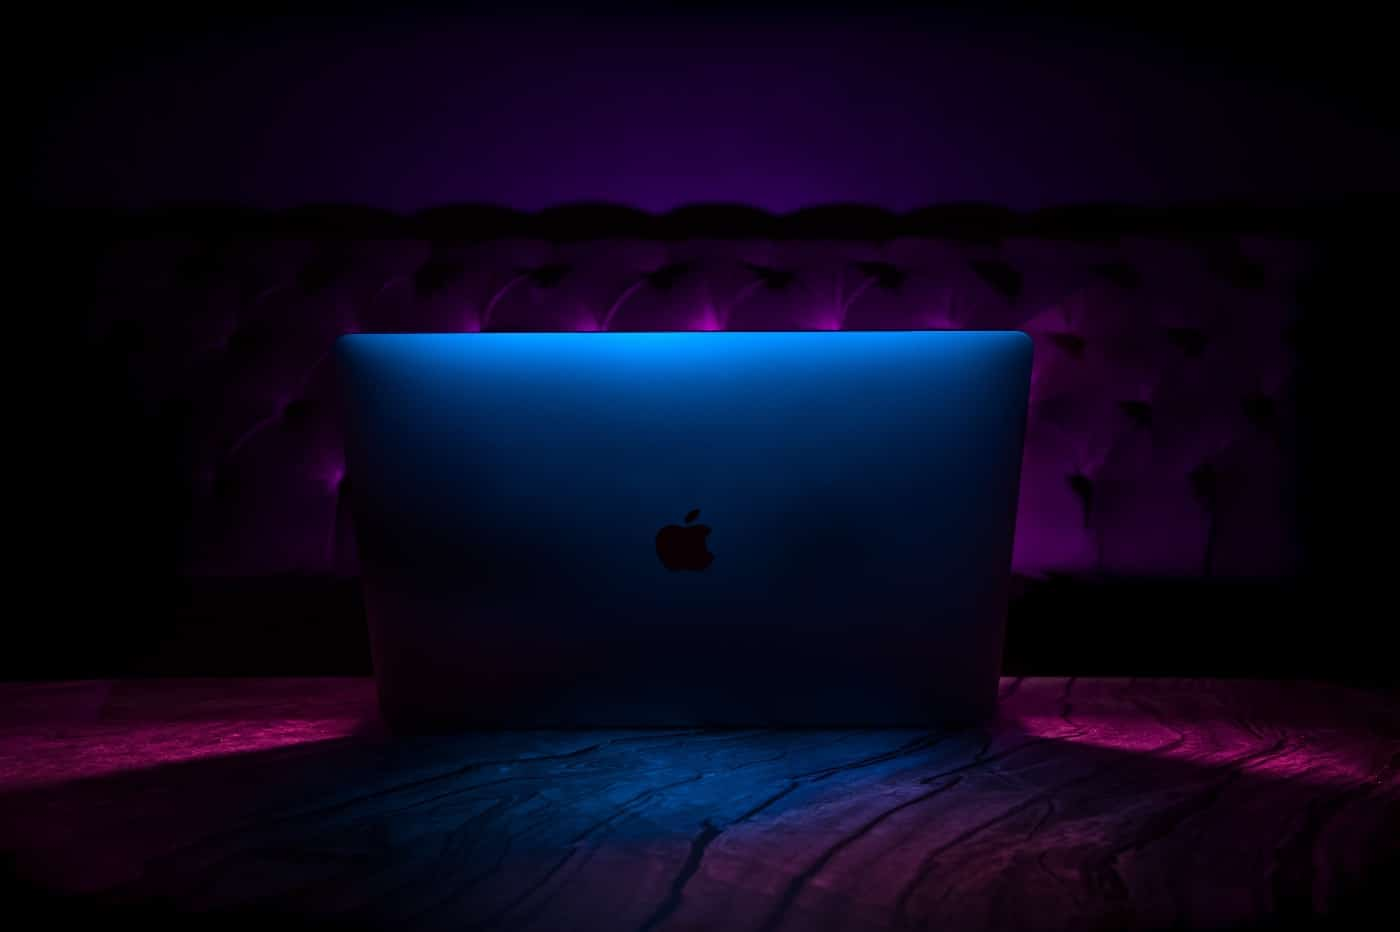 MacBook Pro - Puce M1 - Apple